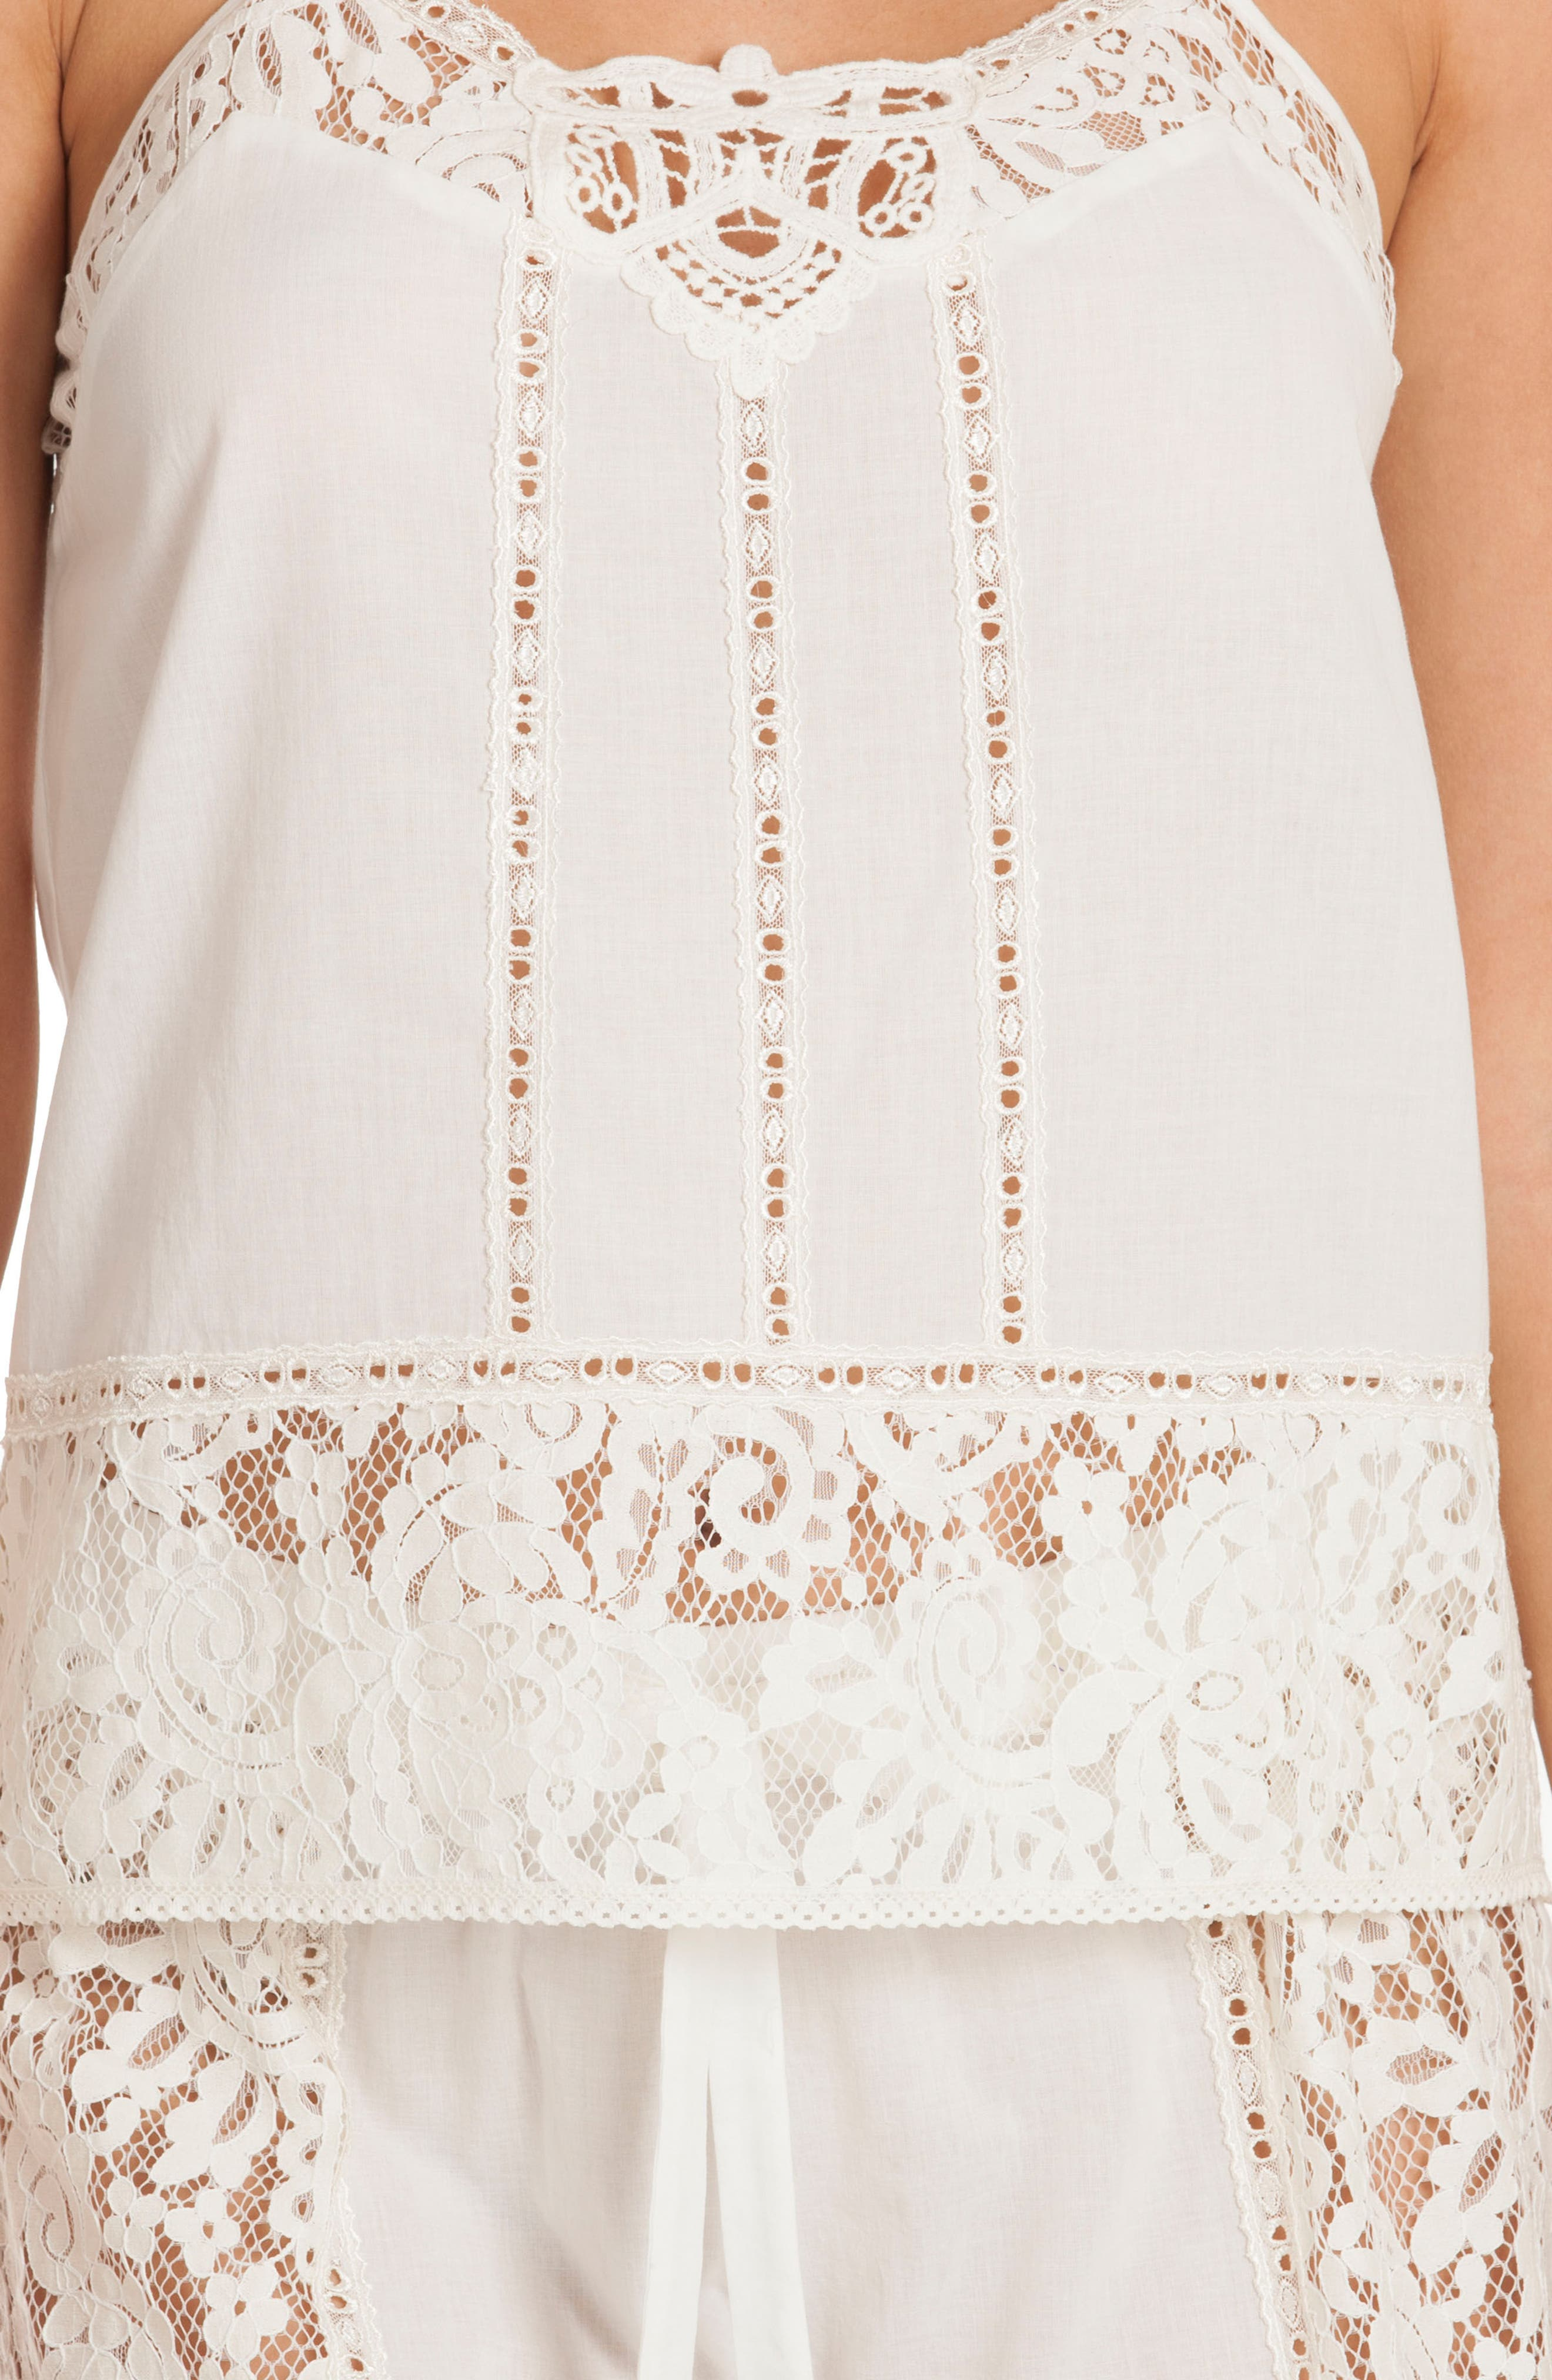 Eyelet Cotton Short Pajamas,                             Alternate thumbnail 5, color,                             Ivory/ Beige